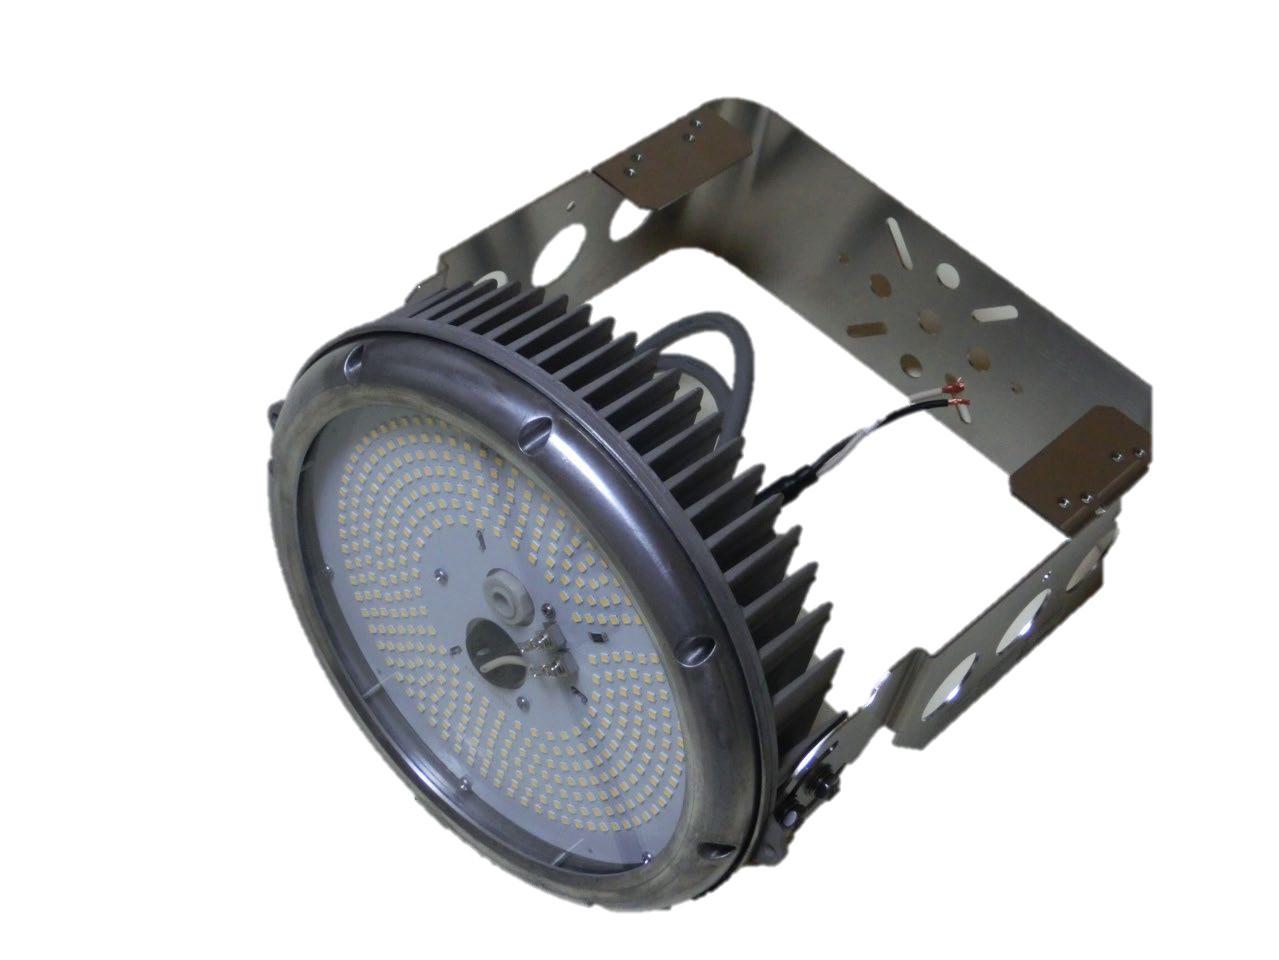 EFG-ARMB-700X-C-N-S-MG製品画像